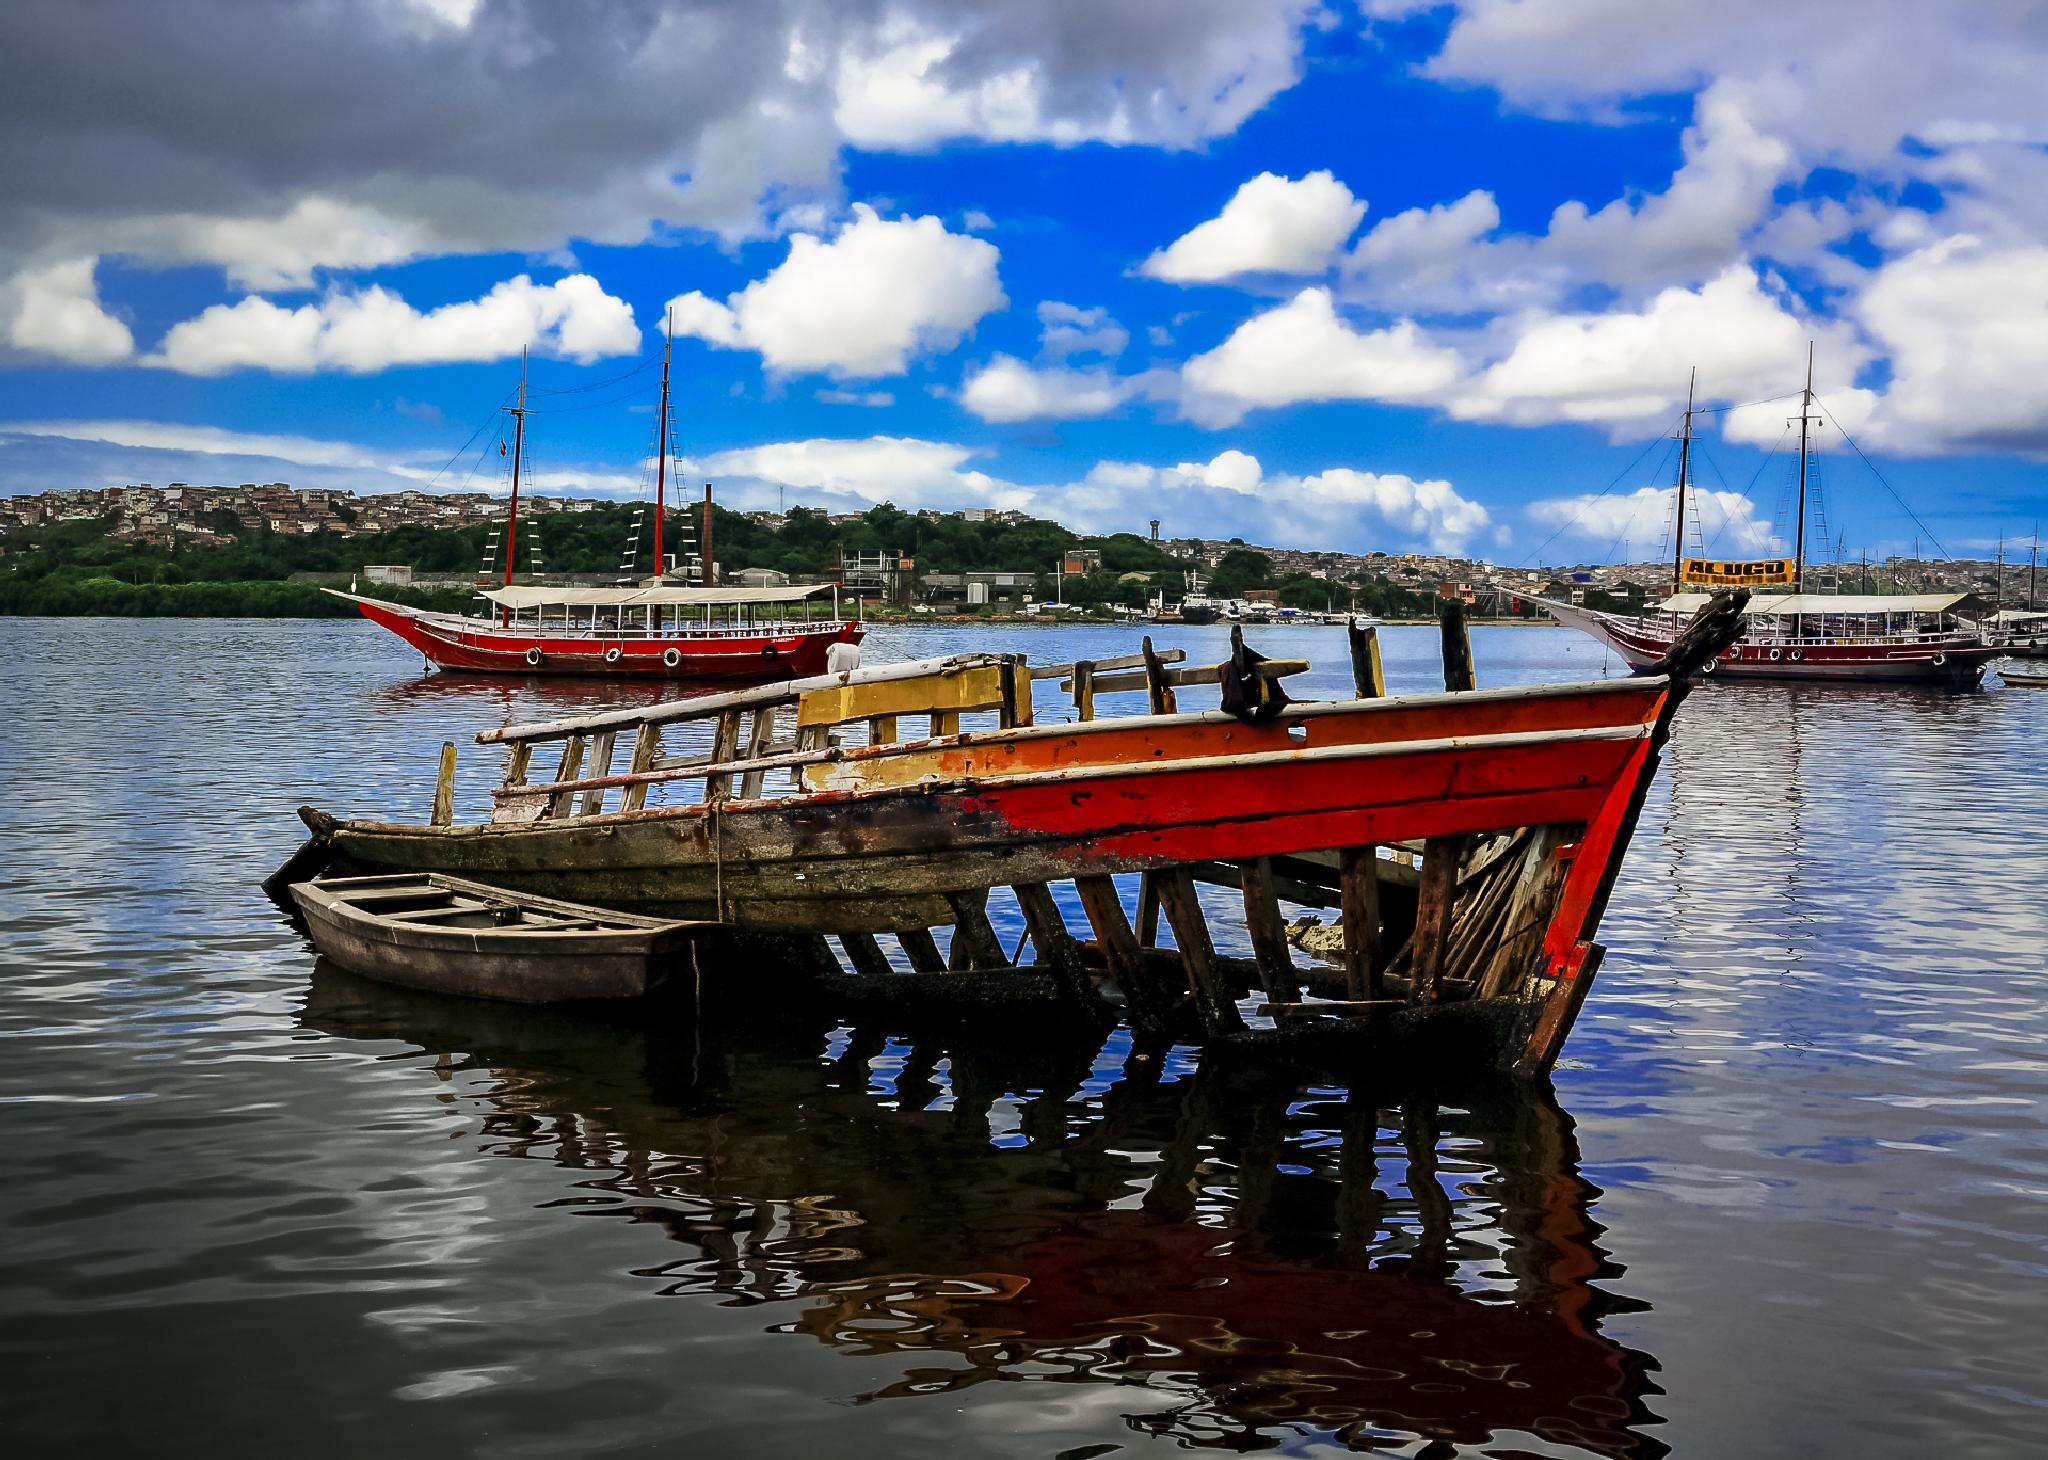 O barco by Robson Carvalho